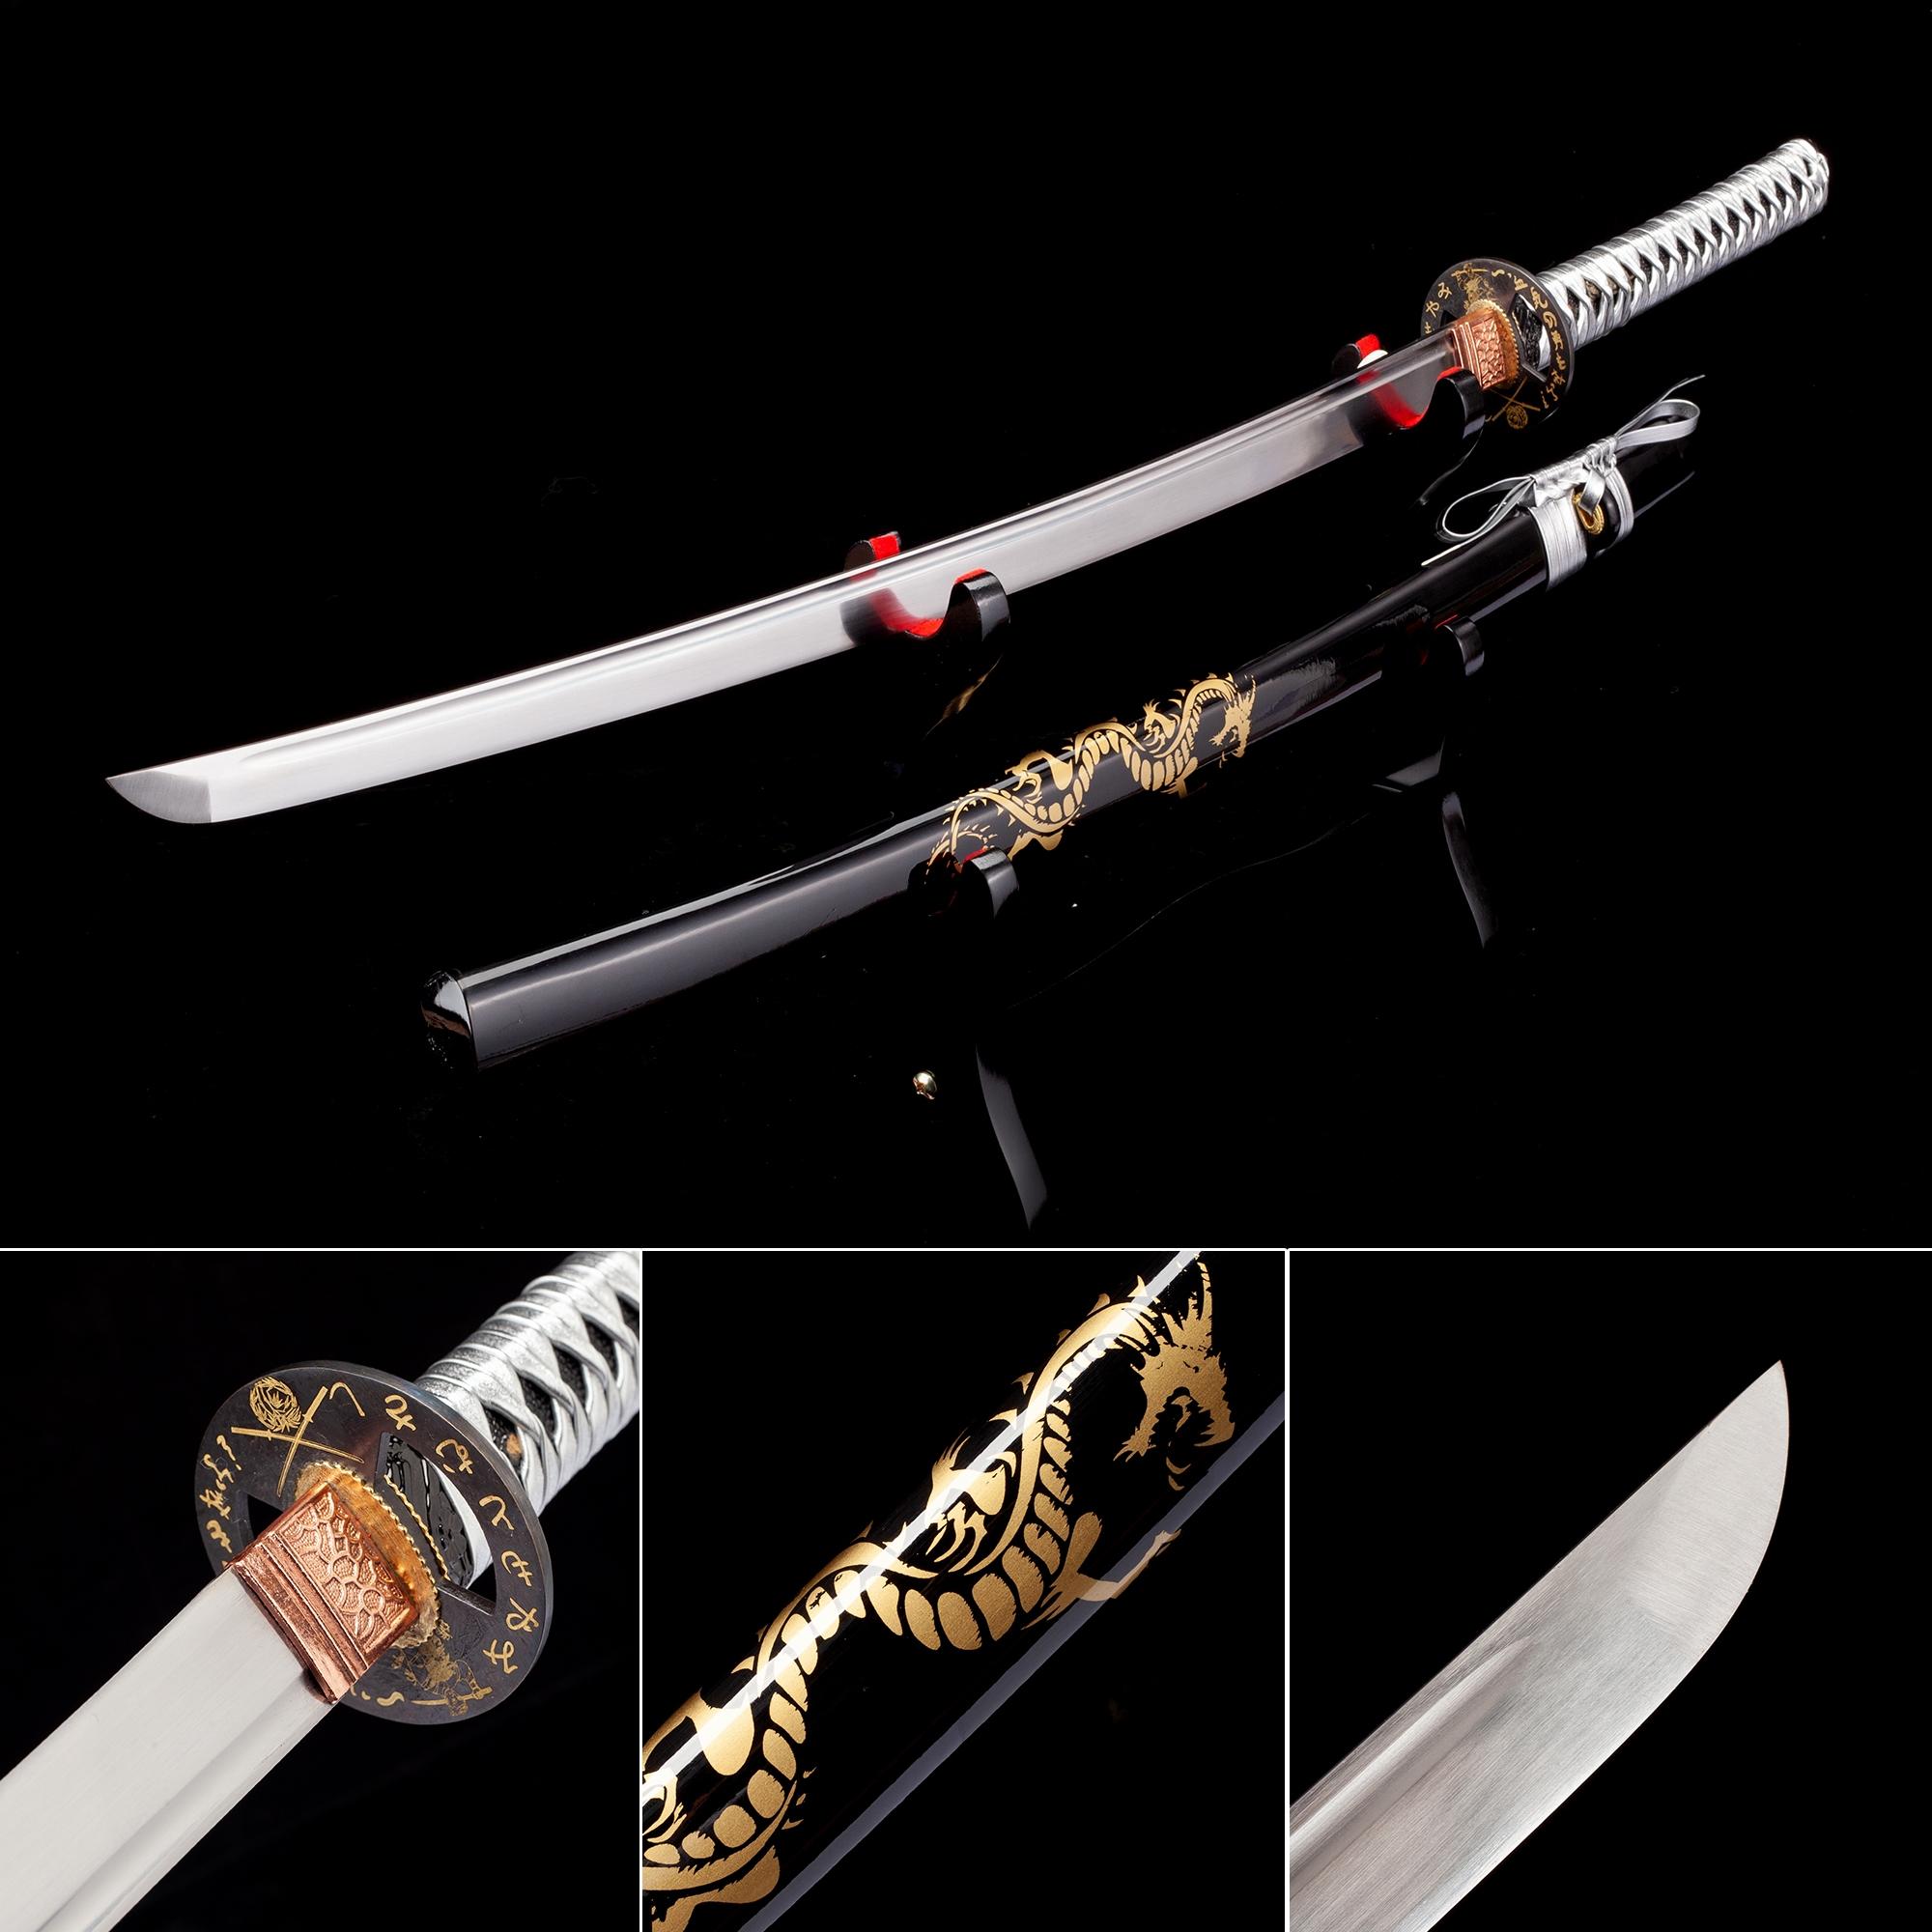 Handmade Japanese Samurai Sword High Manganese Steel With Dragon Theme Scabbard And Silver Handle